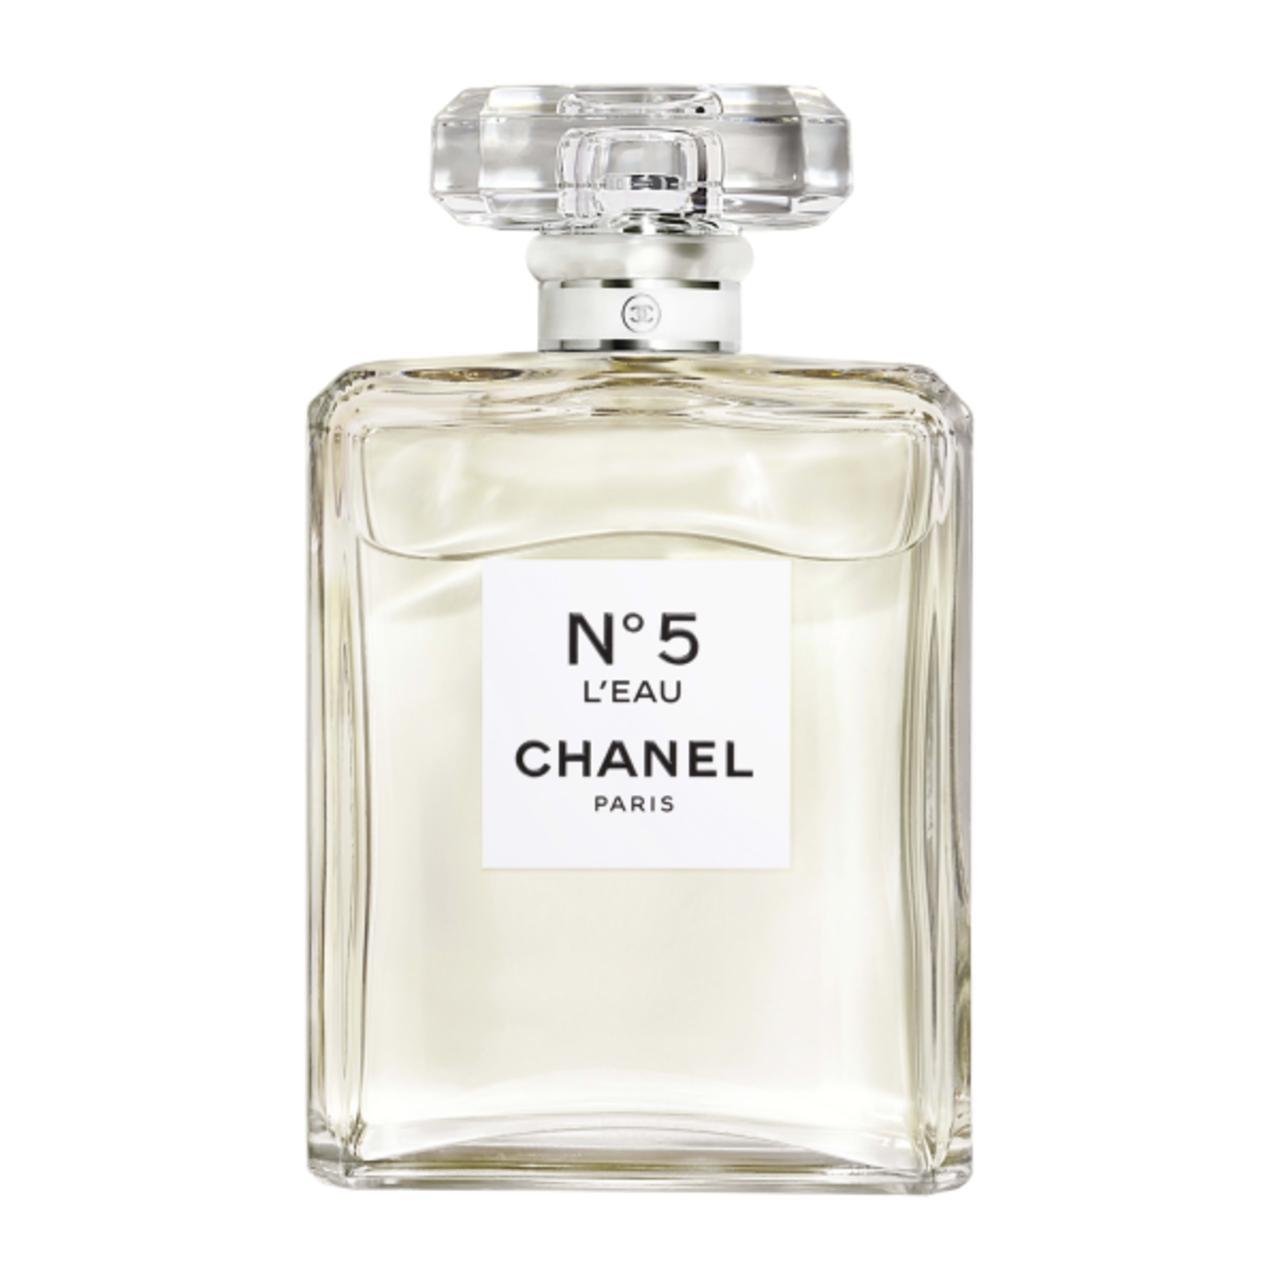 Chanel N5 L'eau edt  100ml Tester, France